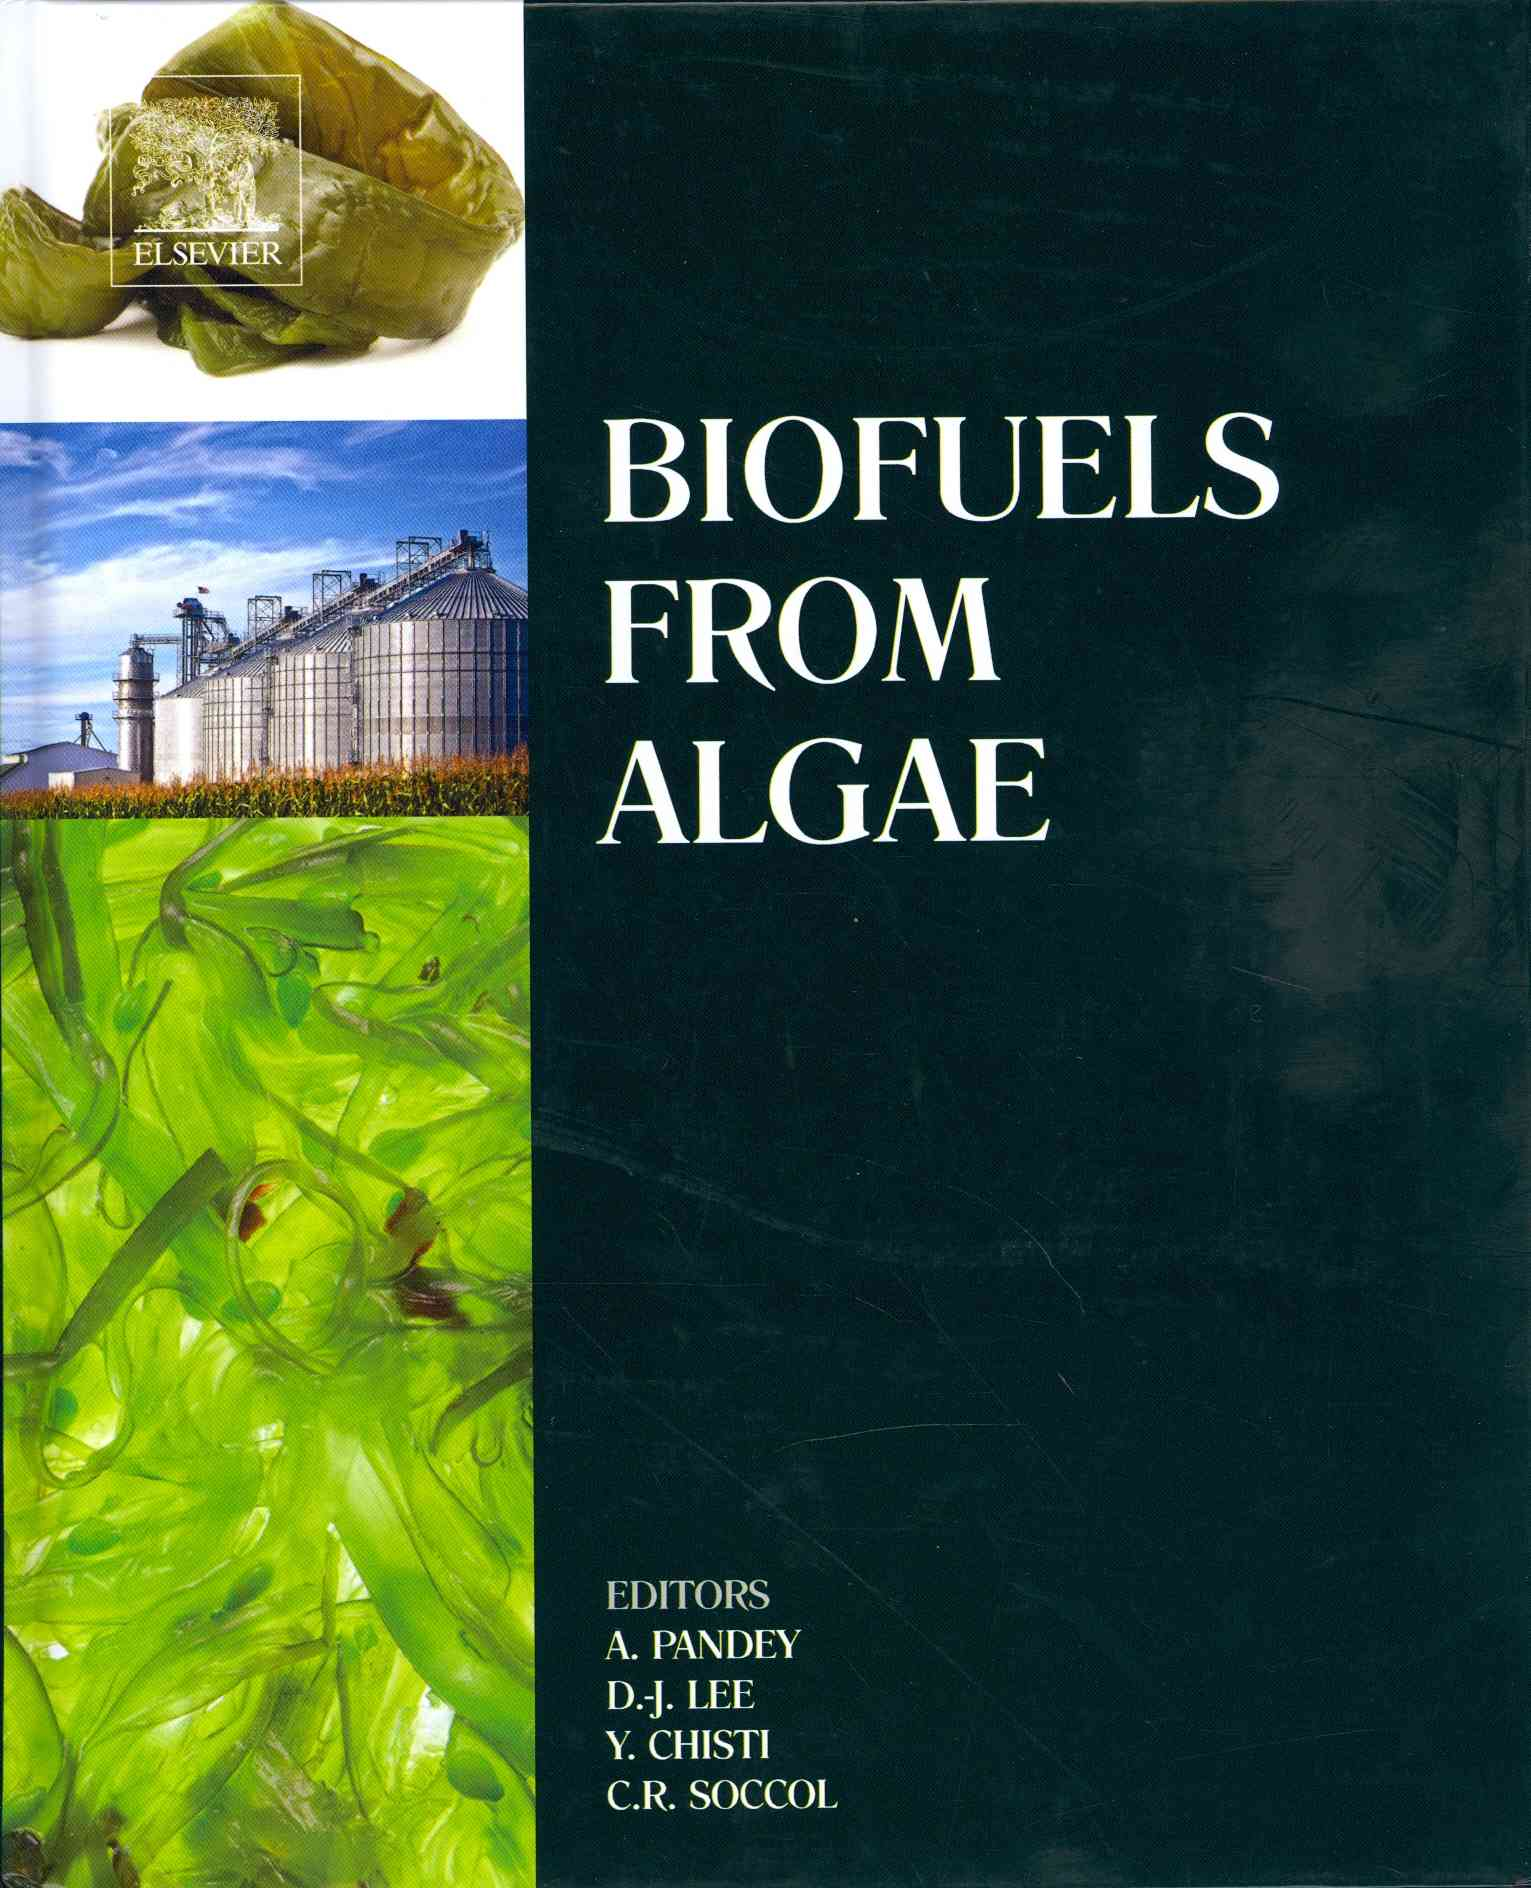 Biofuels from Algae By Pandey, Ashok (EDT)/ Lee, Duu-jong (EDT)/ Chisti, Yusuf (EDT)/ Soccol, Carlos R. (EDT)